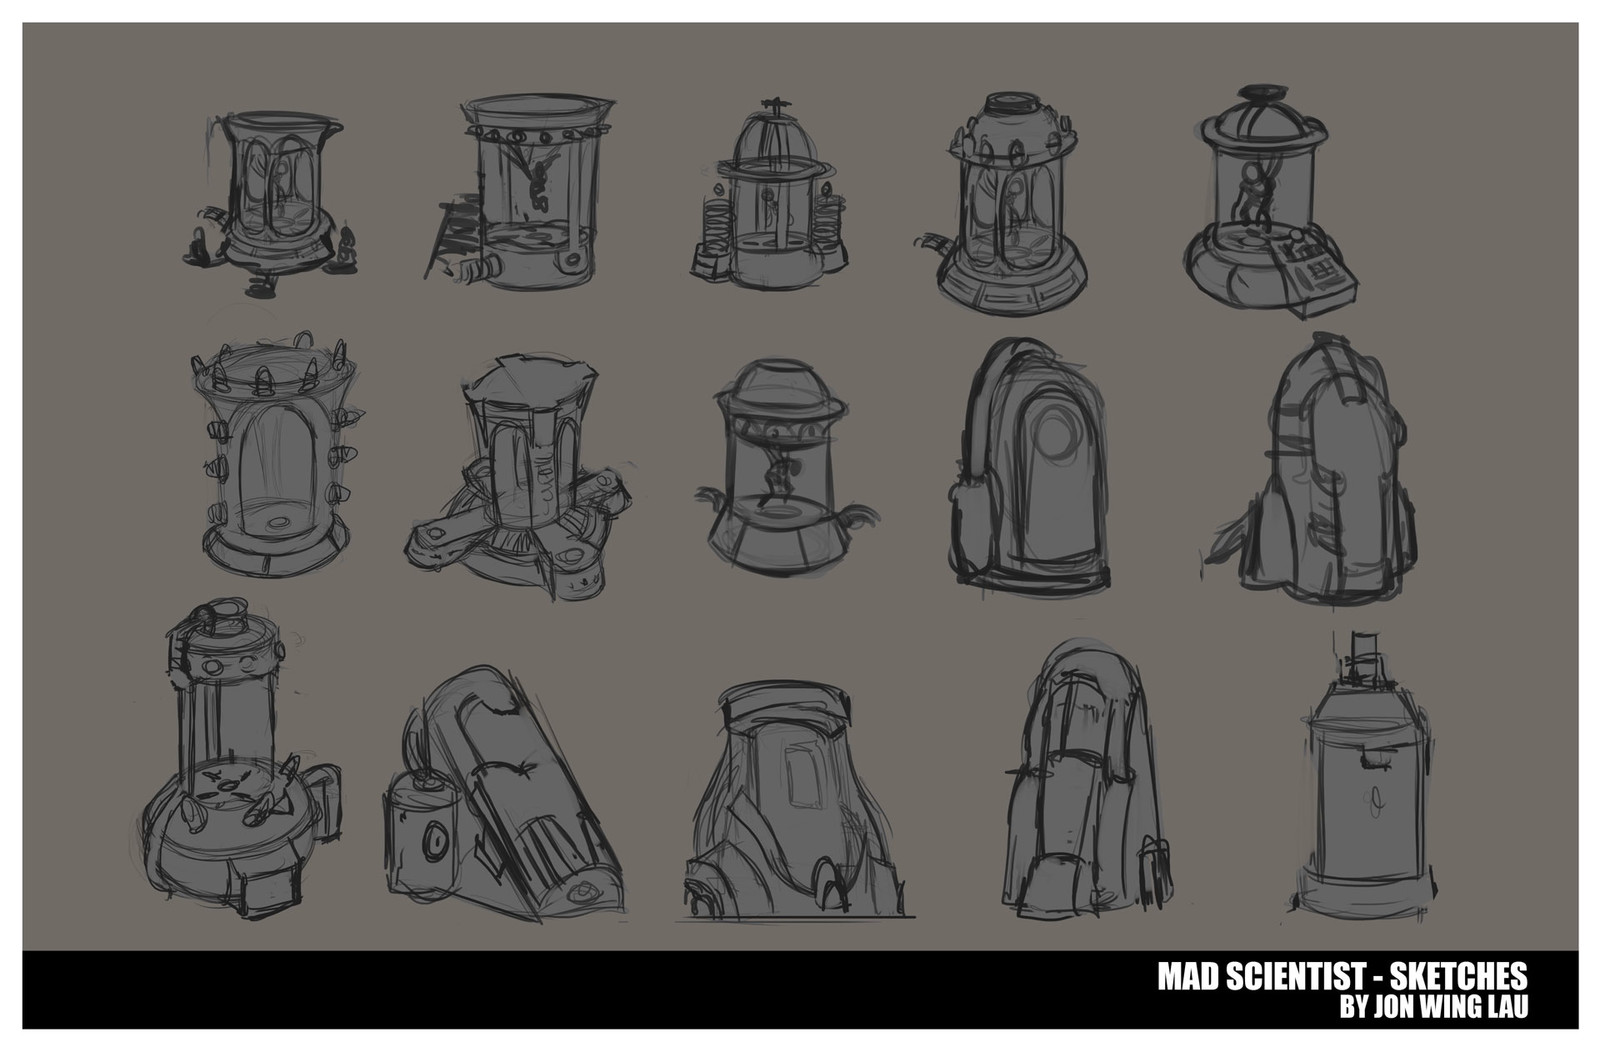 Mad Scientist - Sketches